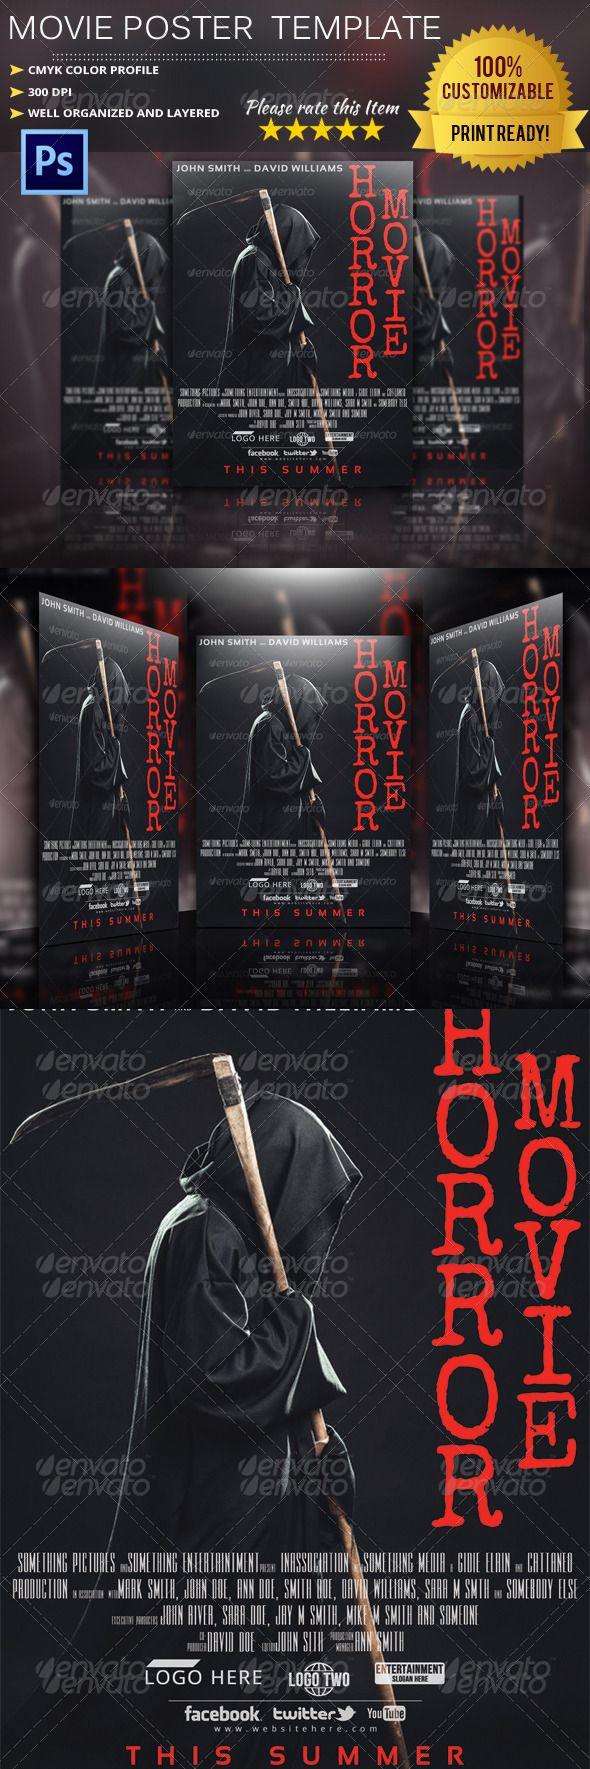 Horror Movie Poster Template | Pinterest